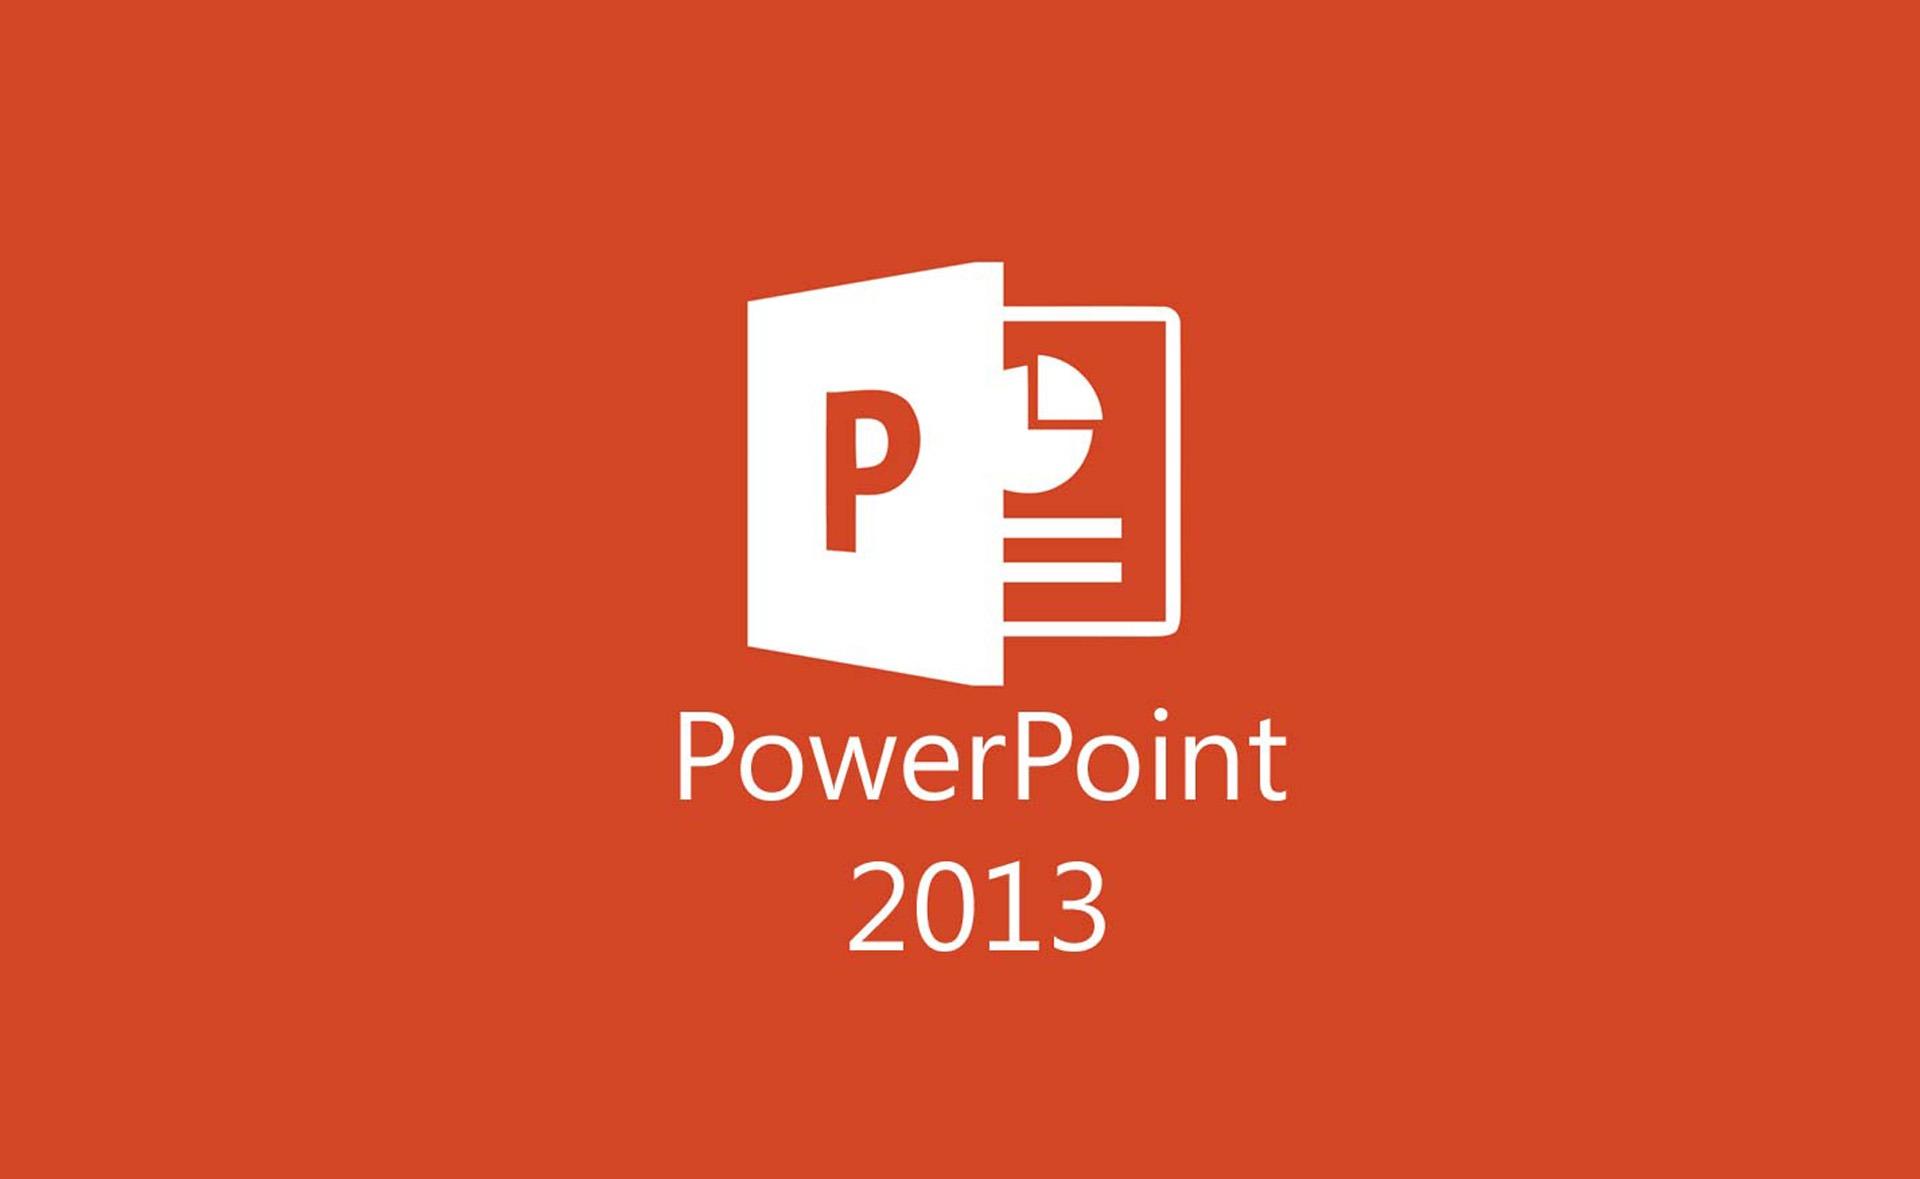 mos powerpoint 2013 online edusa